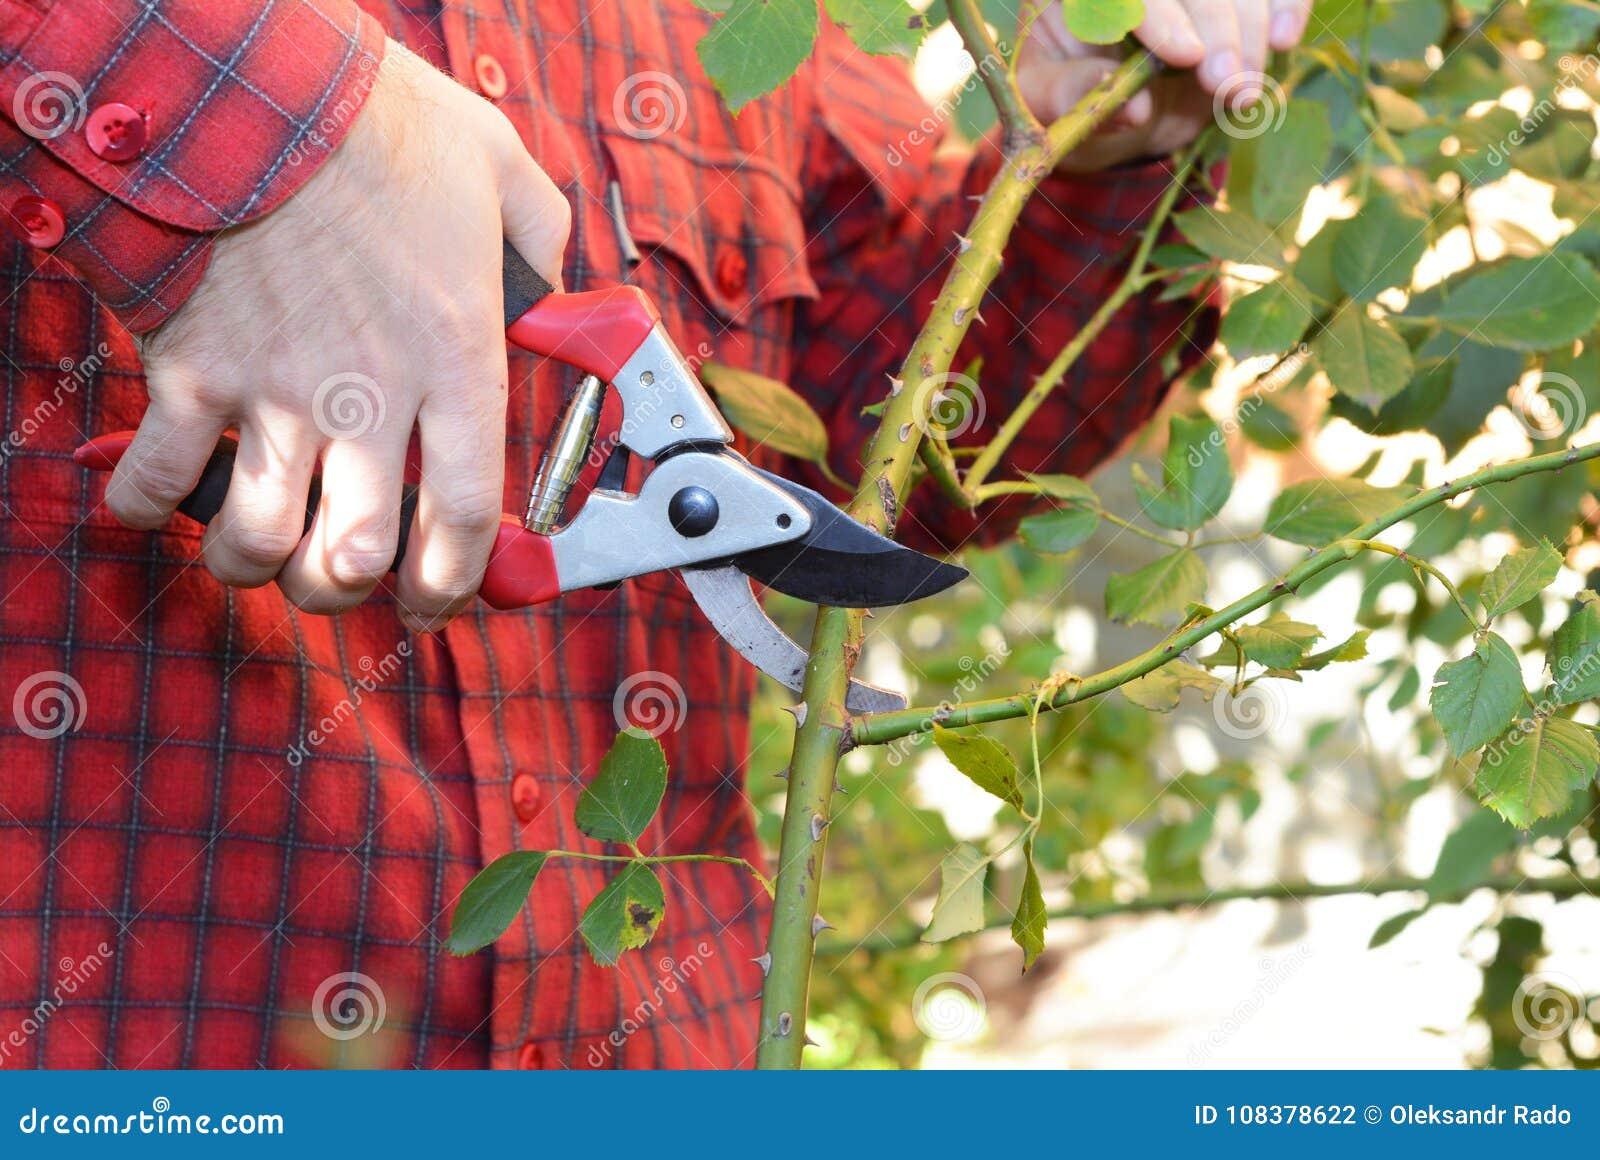 Tuinman die met tuin het snoeien schaar beklimmend rozen for Opleiding tuin